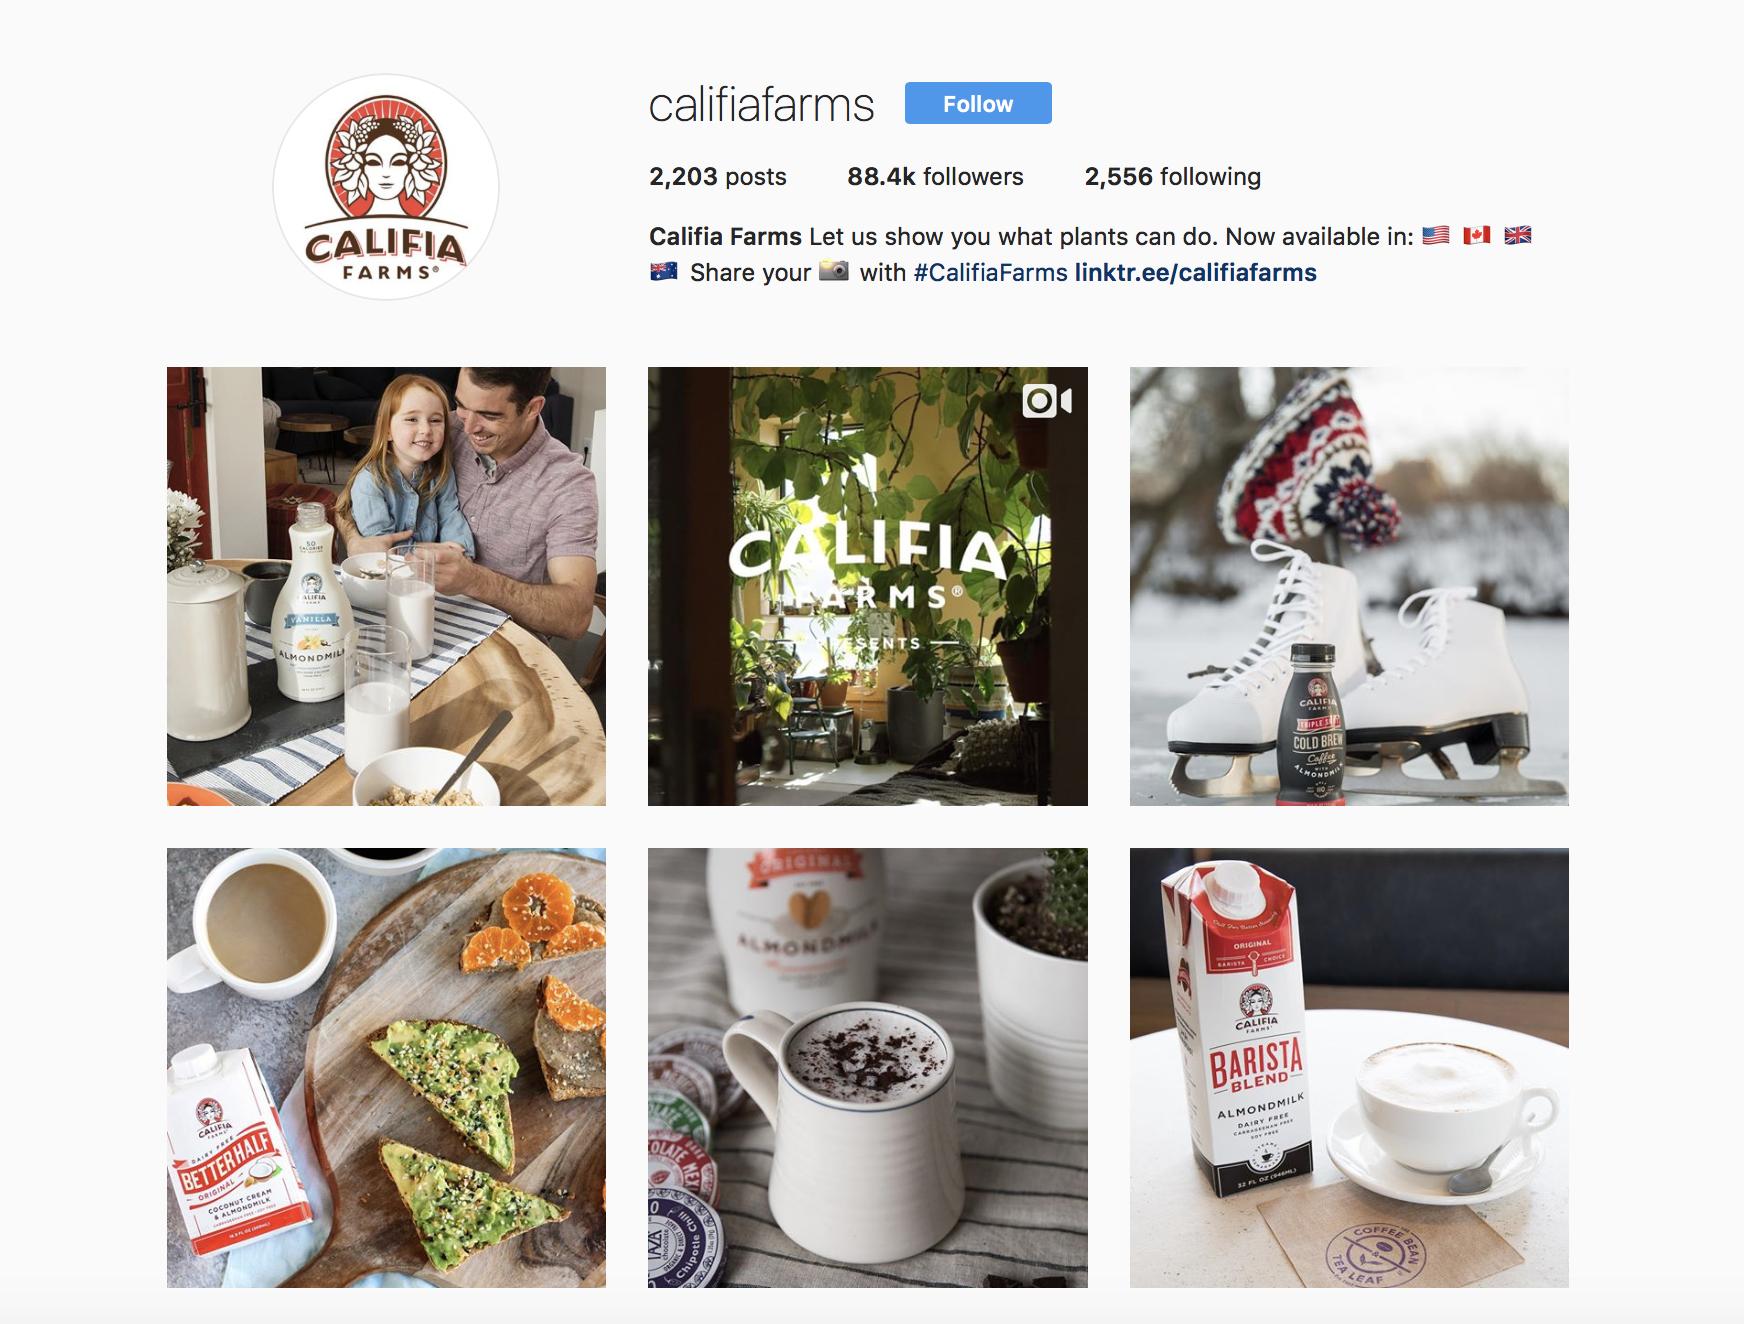 califia-farms-best-brands-on-instagram